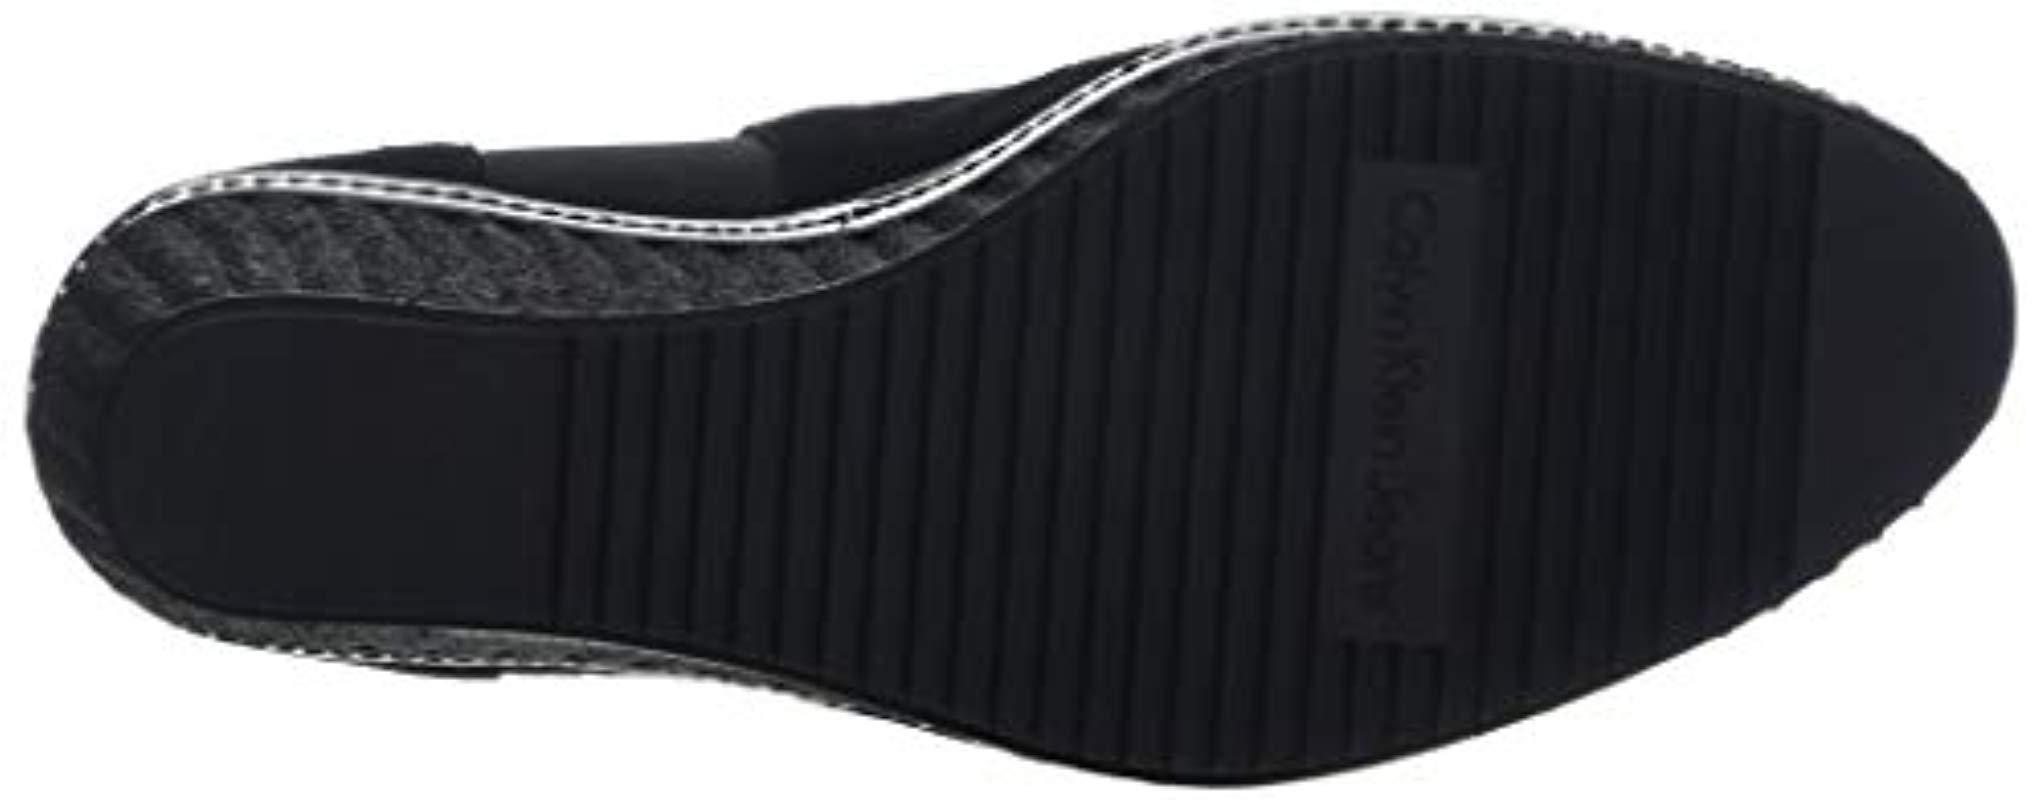 Calvin Klein - Black Shanna Suede Ankle Boots - Lyst. View fullscreen 1b67f55e4d4